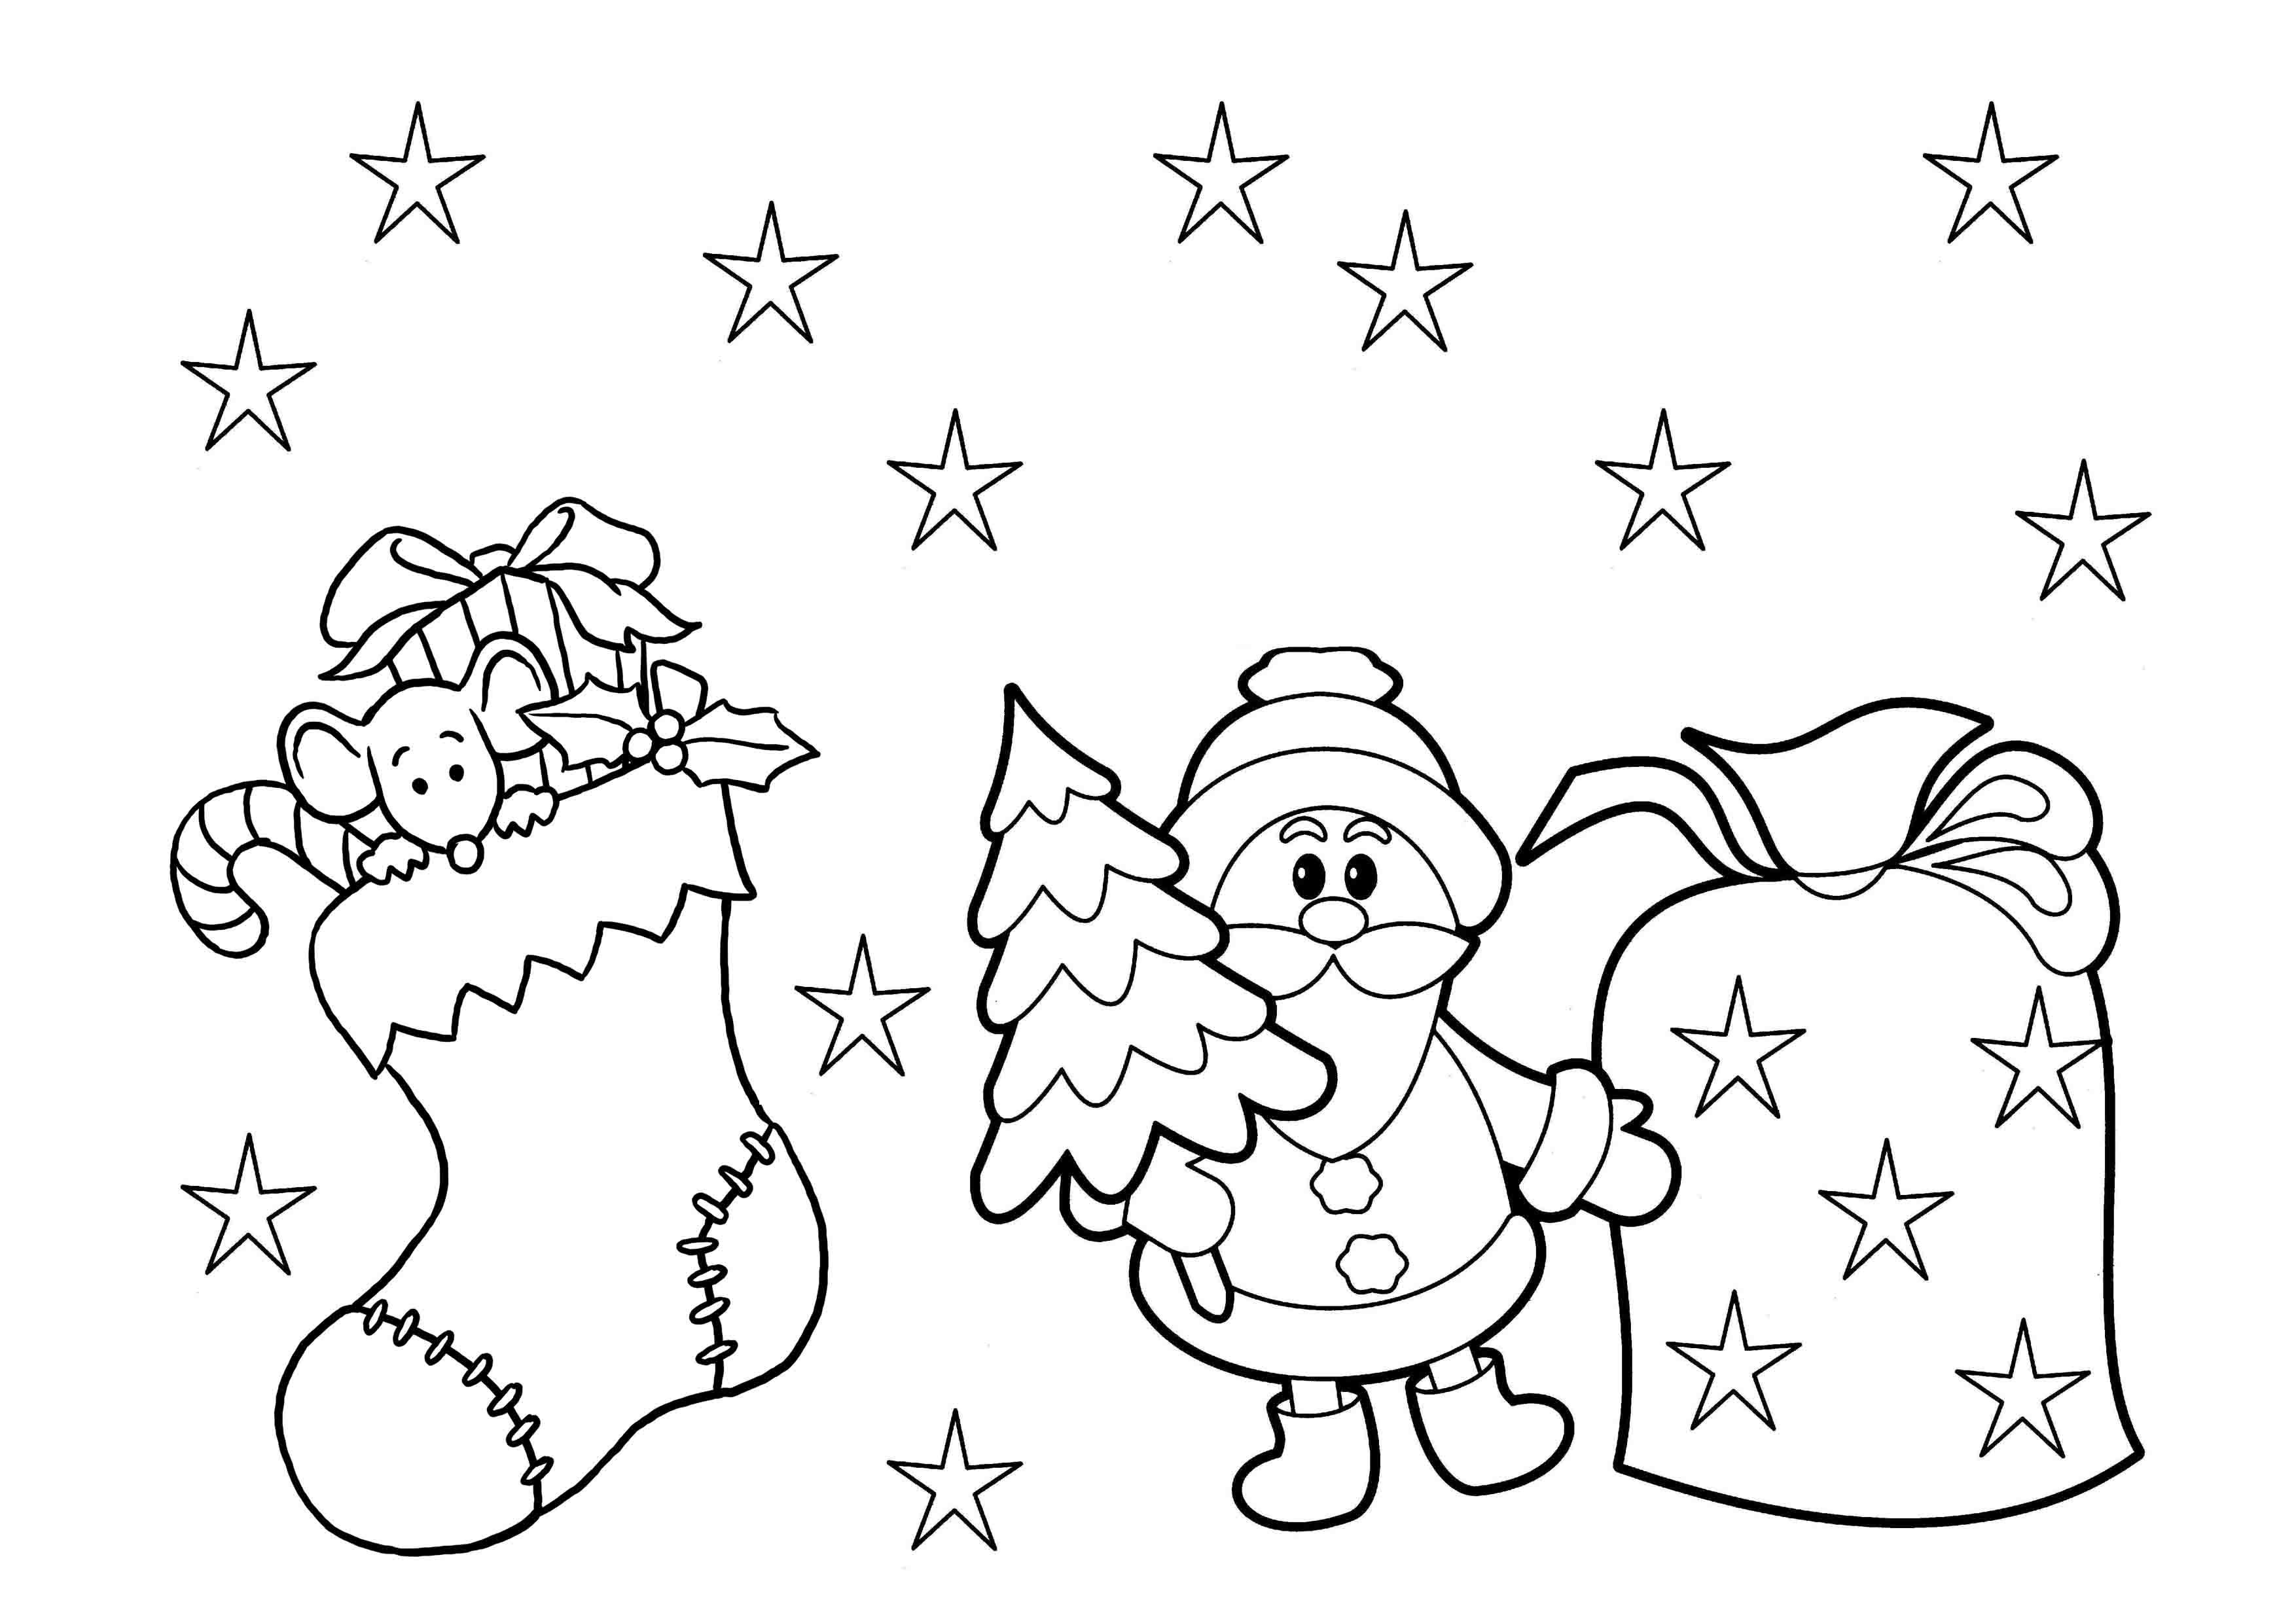 Coloring ~ Christmas Stocking To Colorree Printable Coloring Pages - Christmas Pictures To Color Free Printable